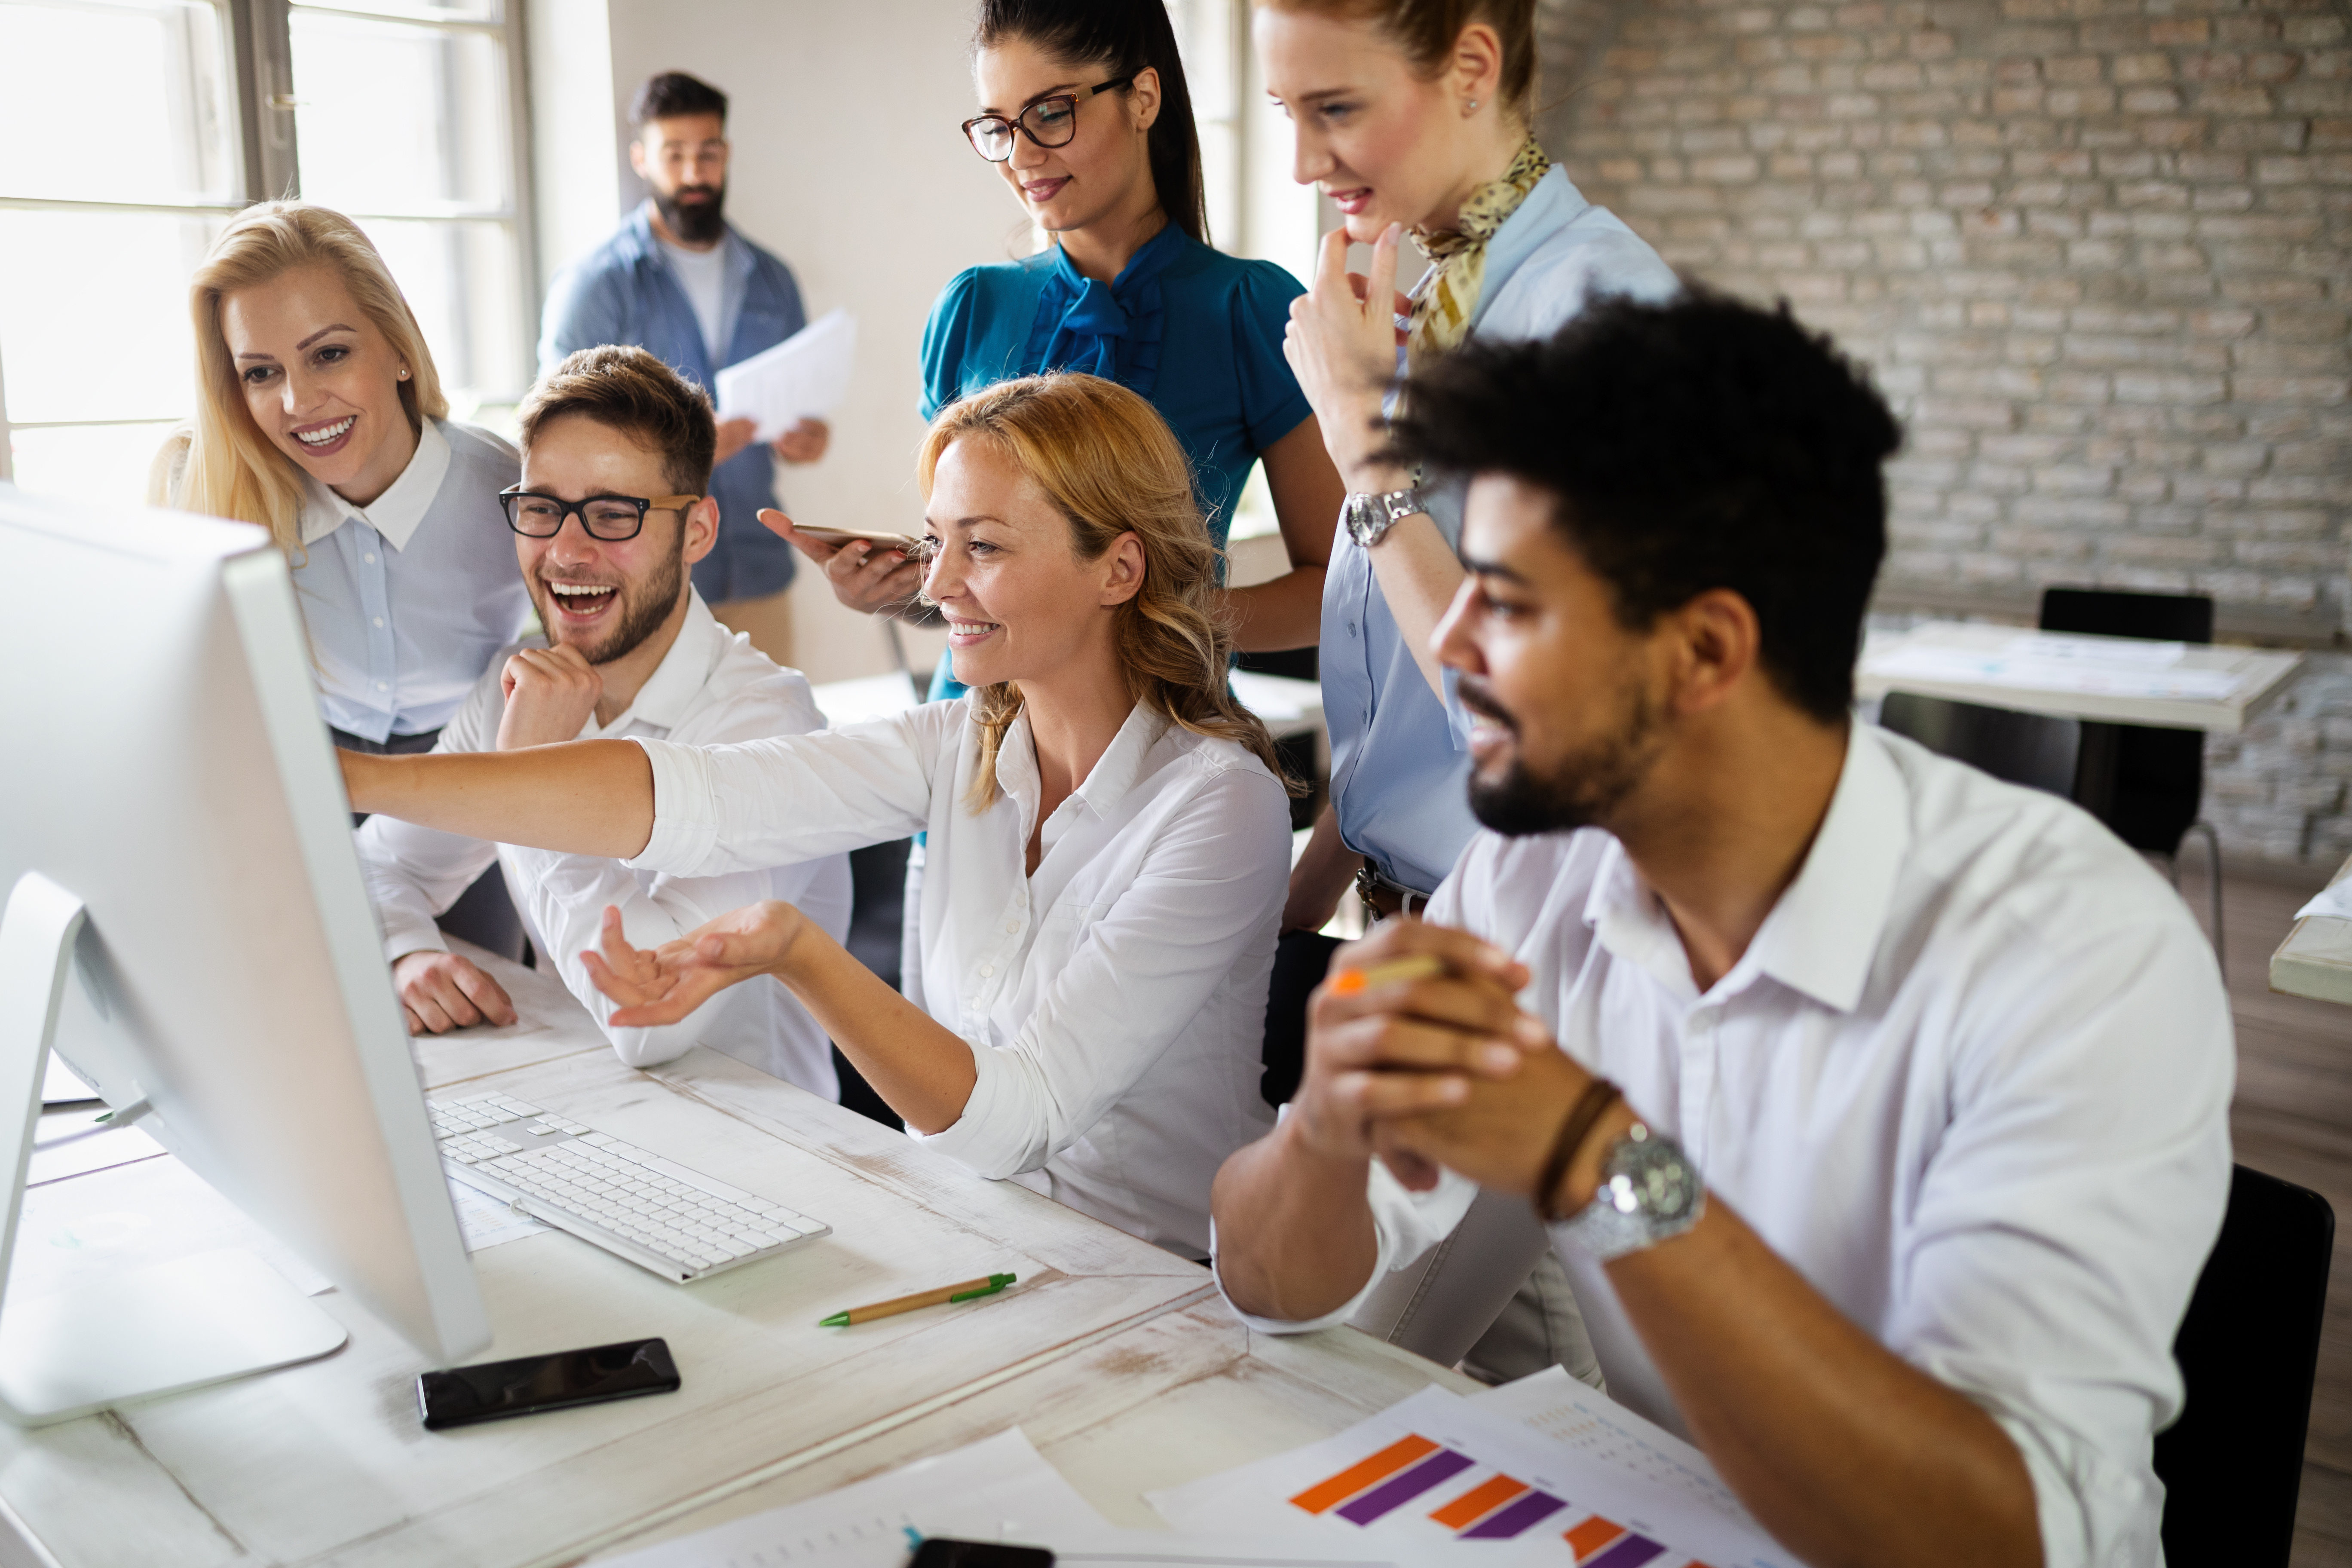 Startup Diversity Teamwork Brainstorming Business Meeting Concept